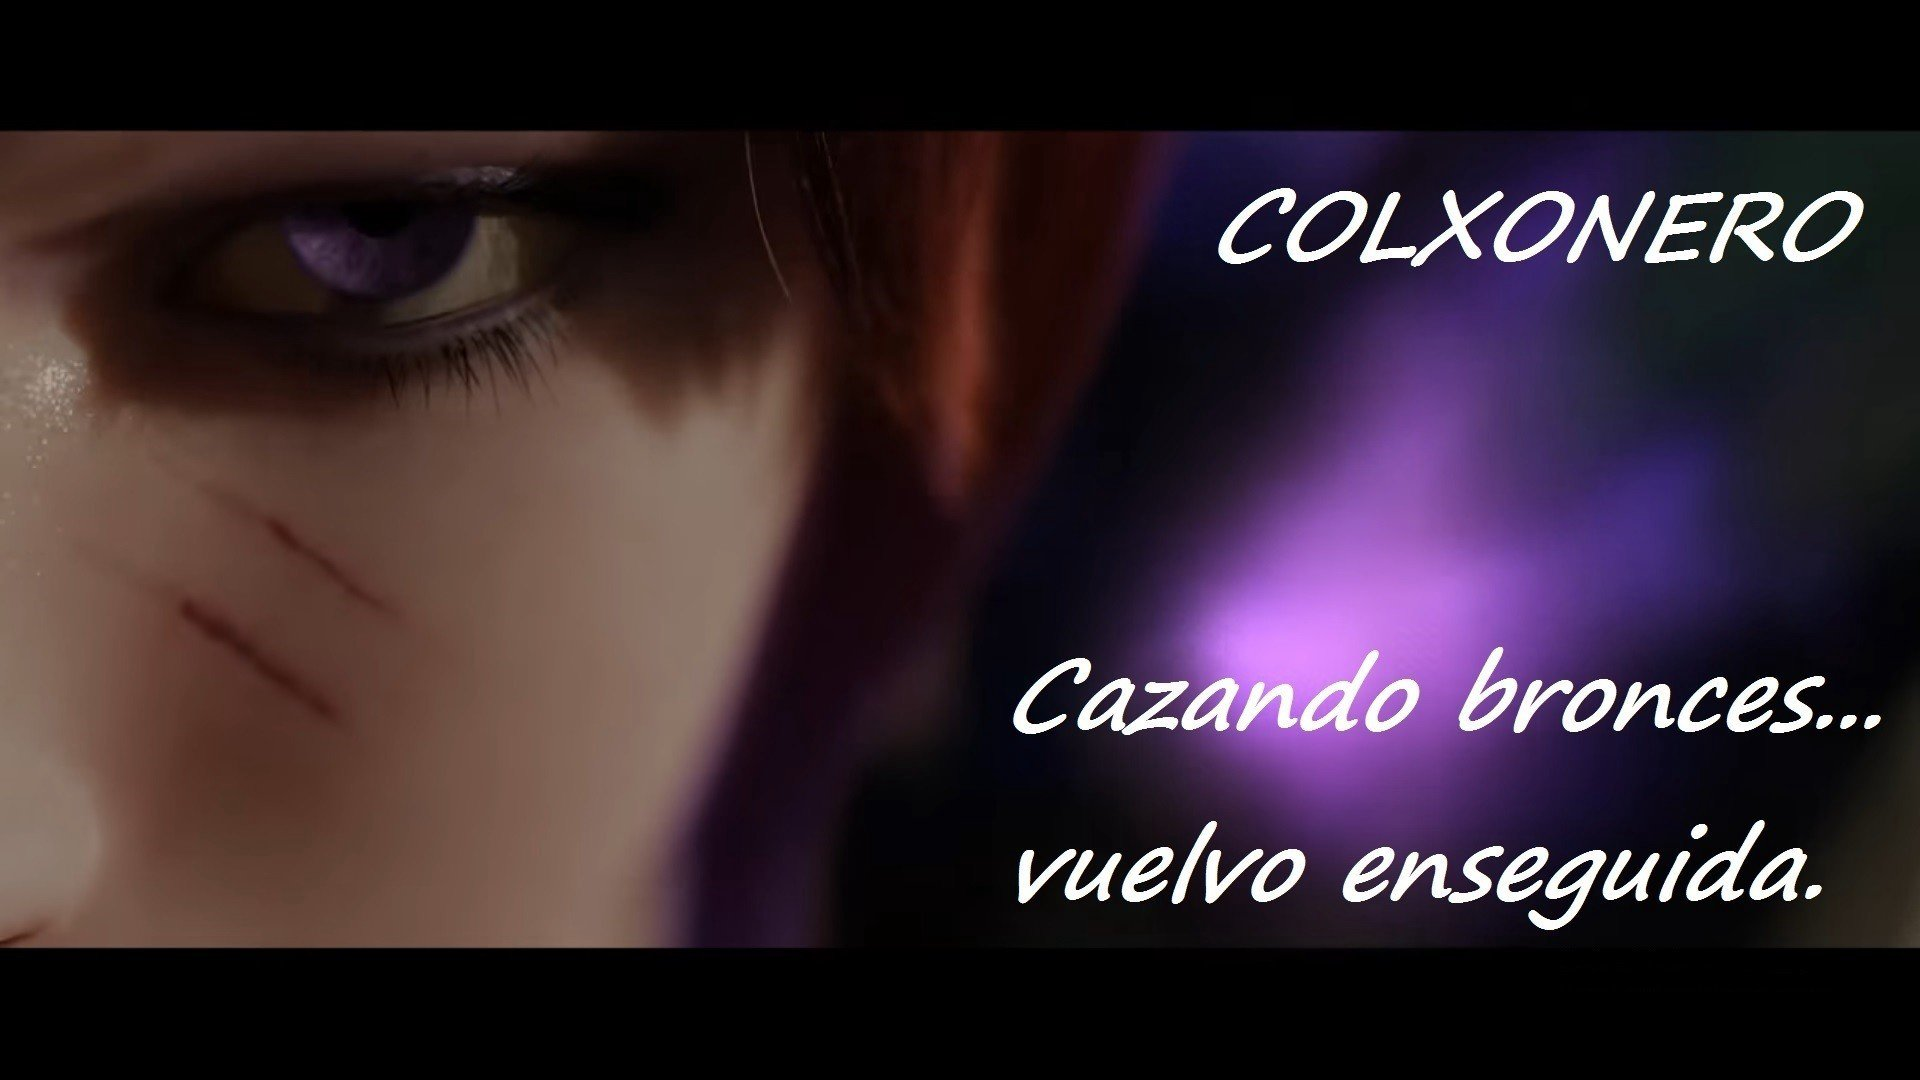 Colxonero